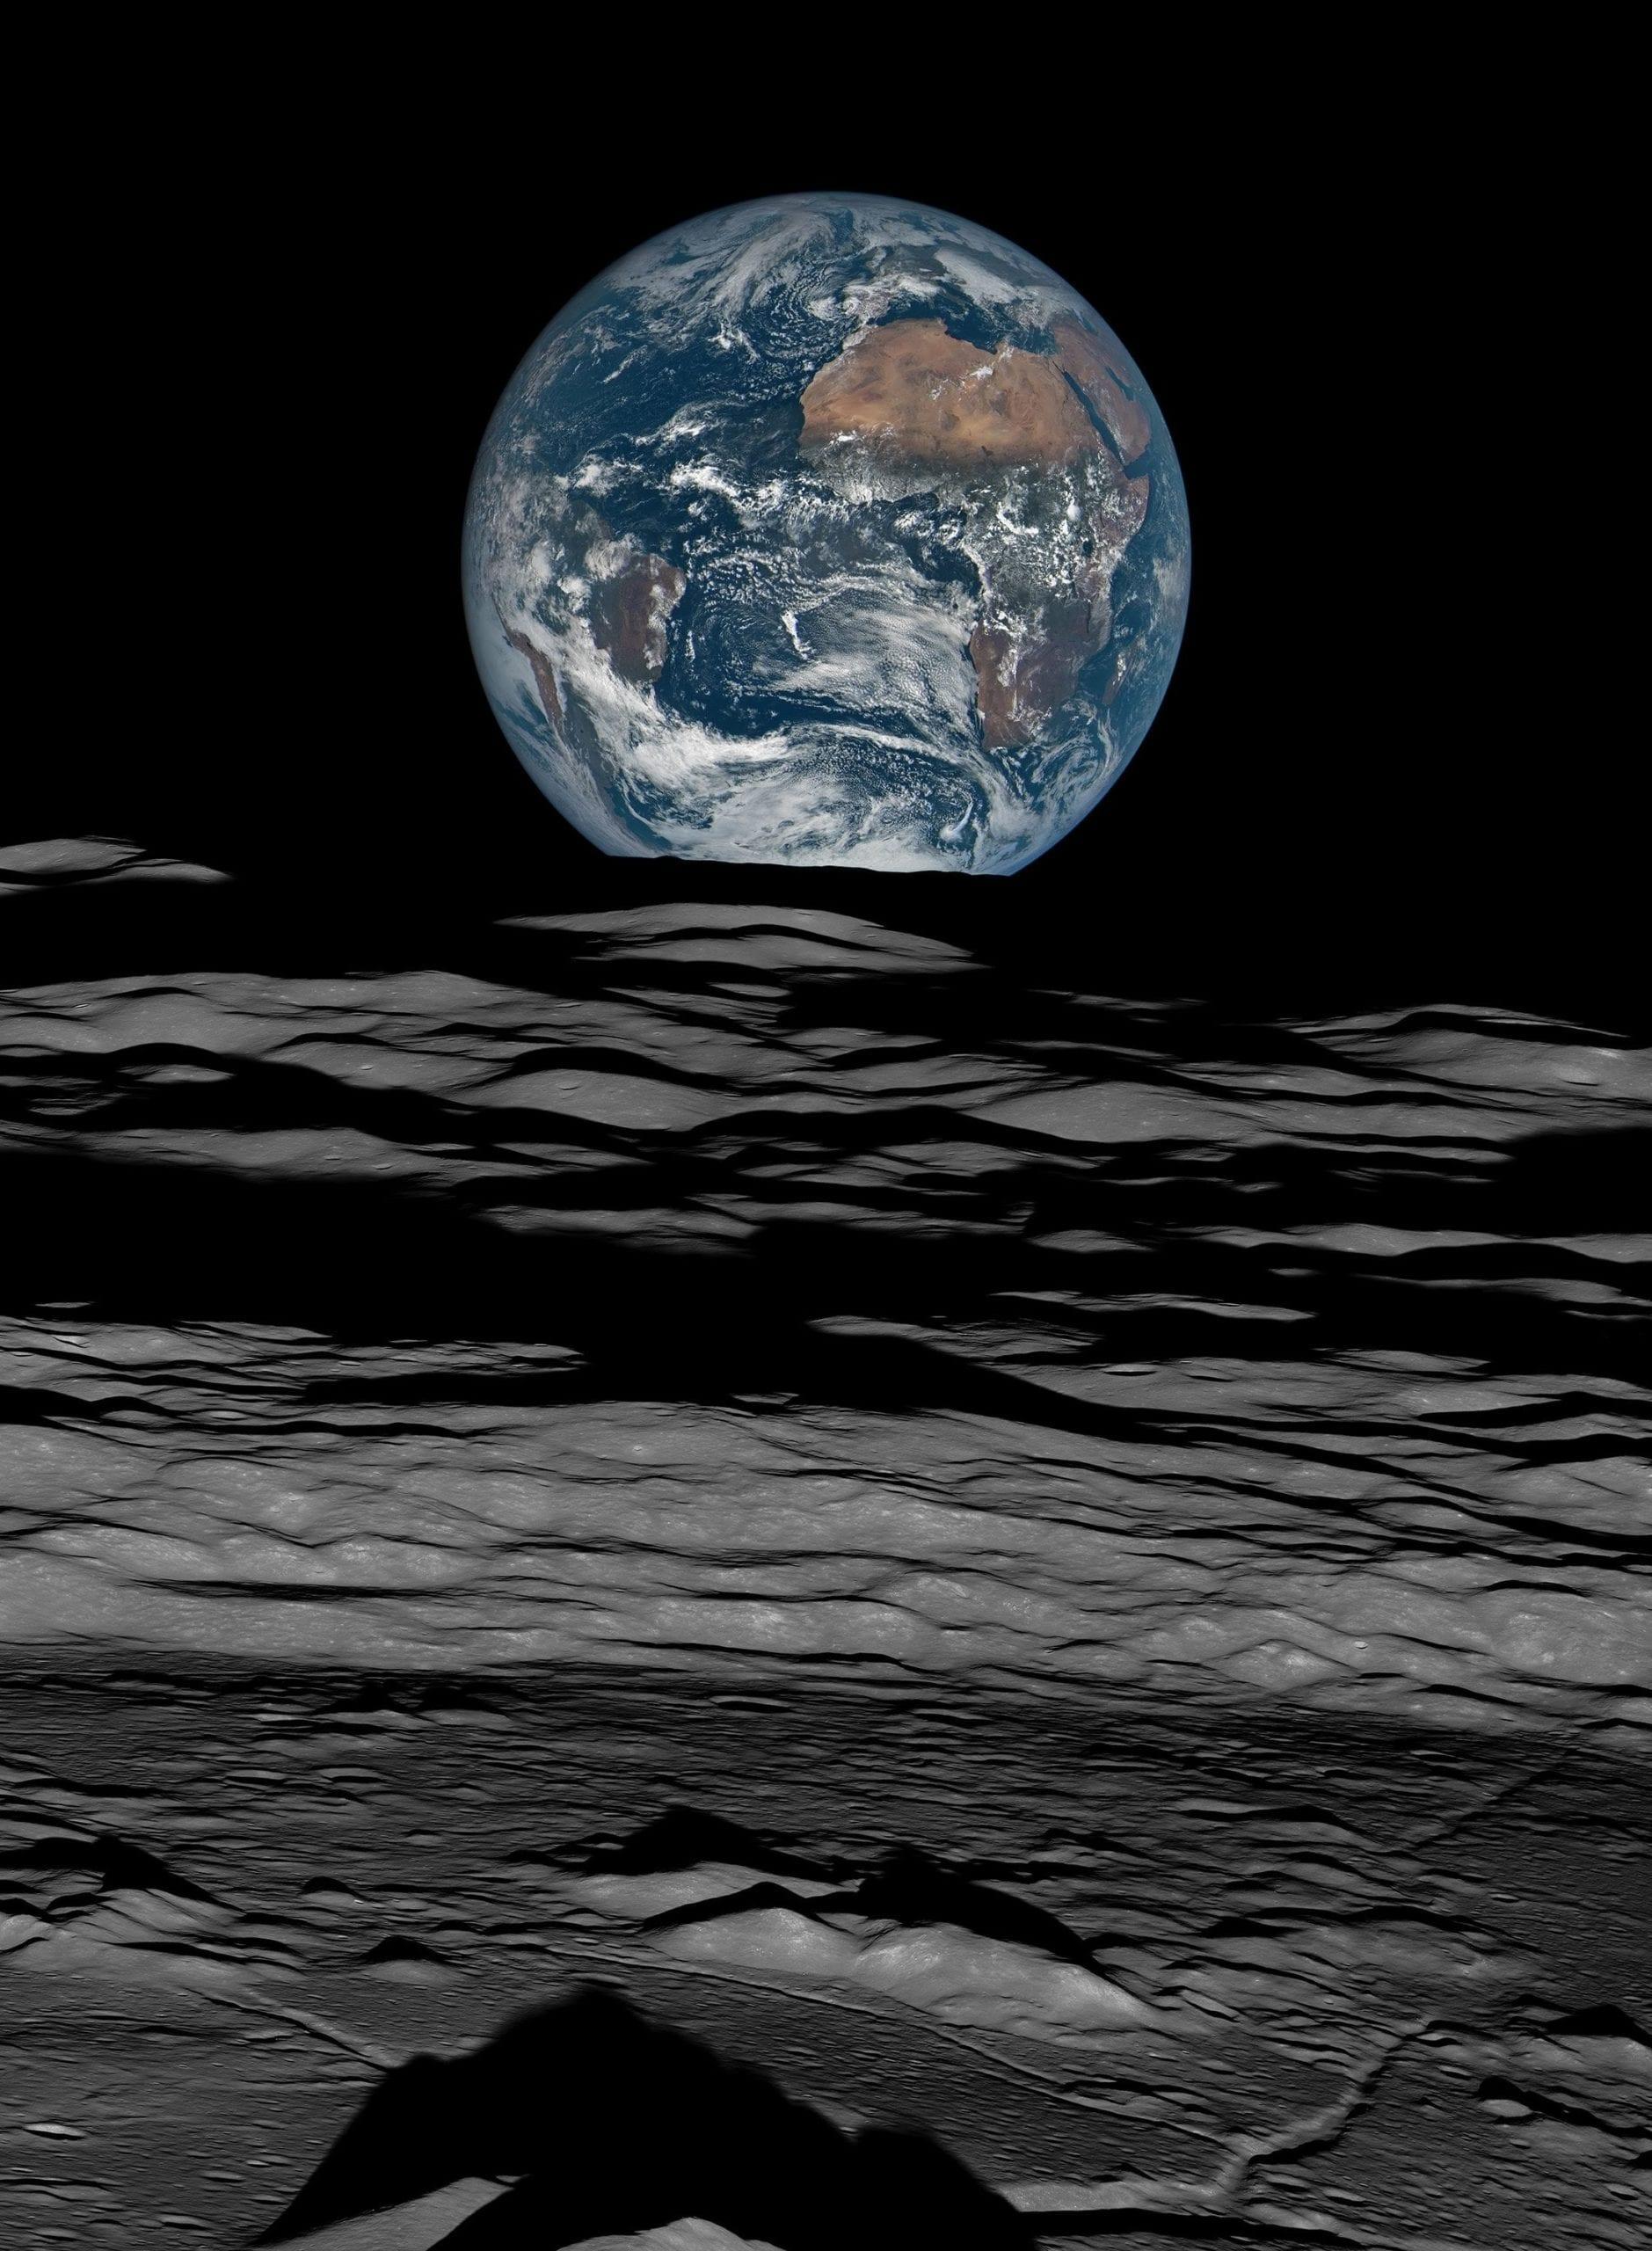 Earth Over the Lunar Horizon, Lunar Reconnaissance Orbiter, 12 October, 2015, 2016, Mosaic Composite Photograph, Digital C-print